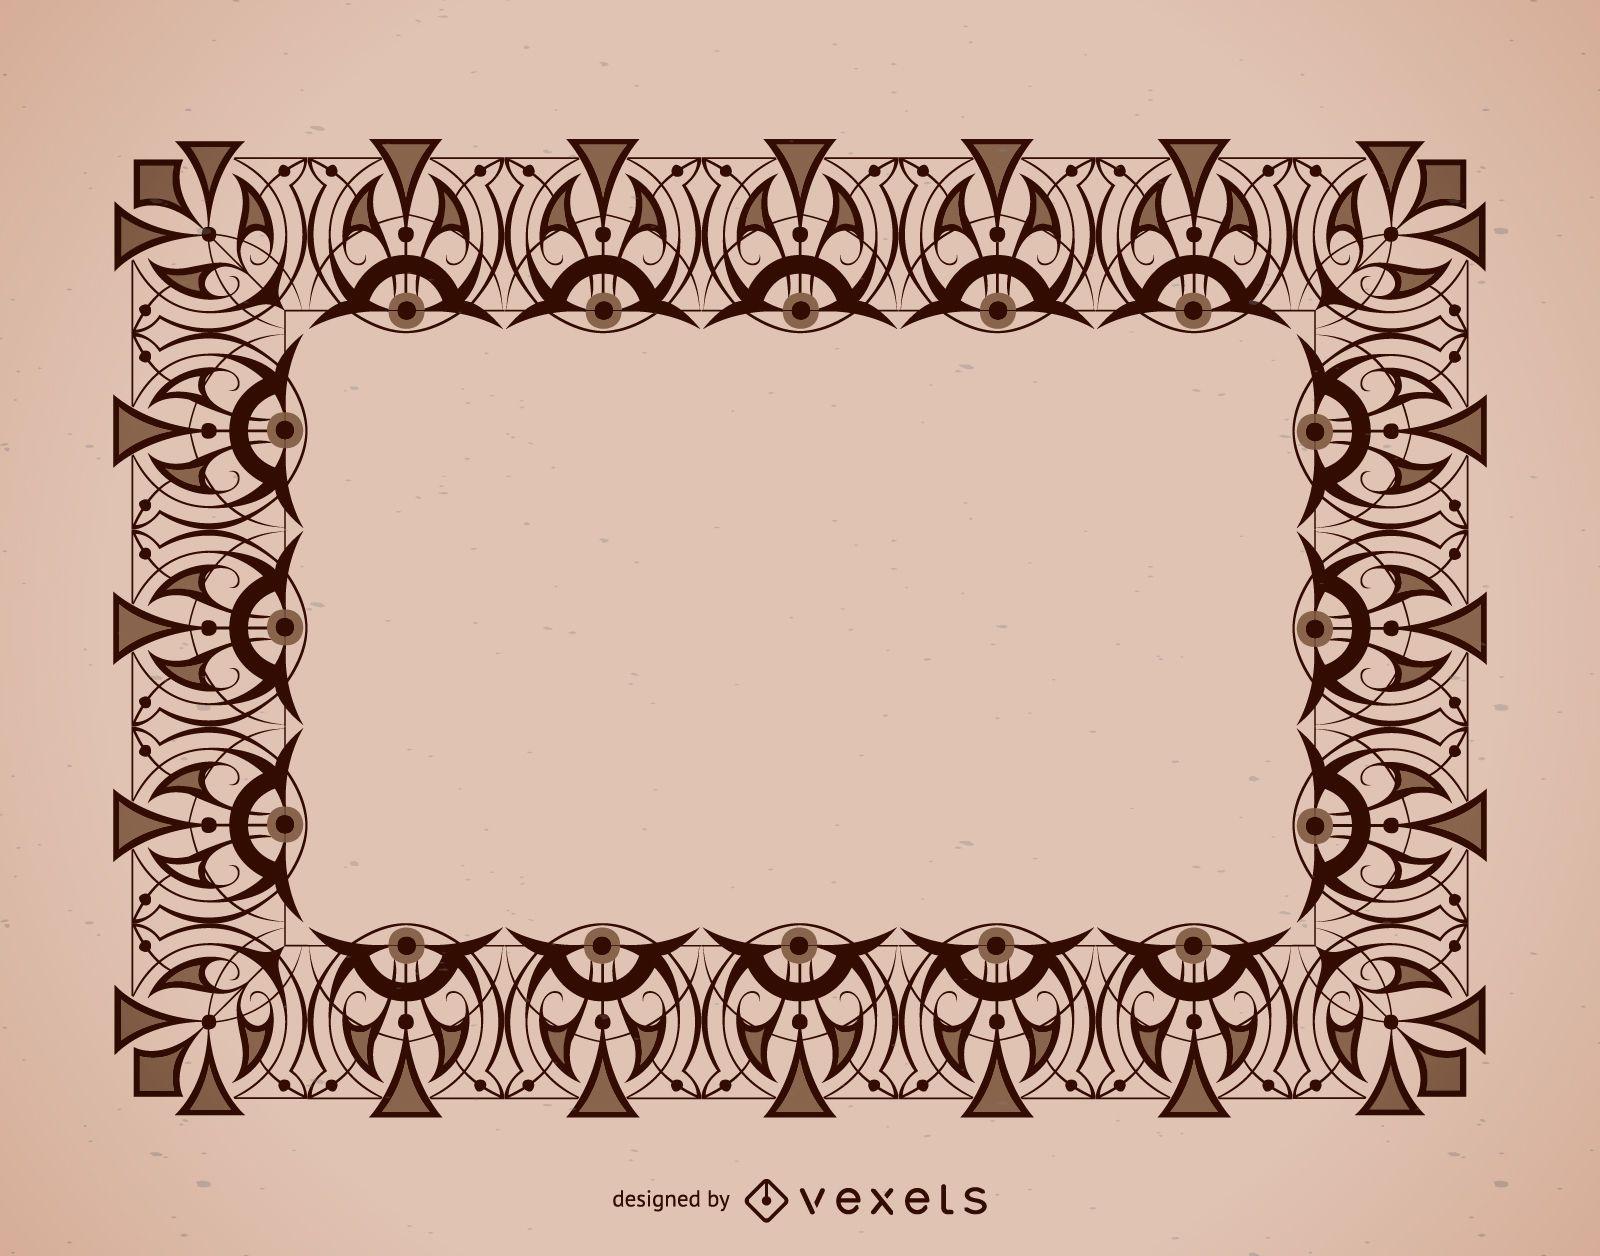 Detailed ornaments frame